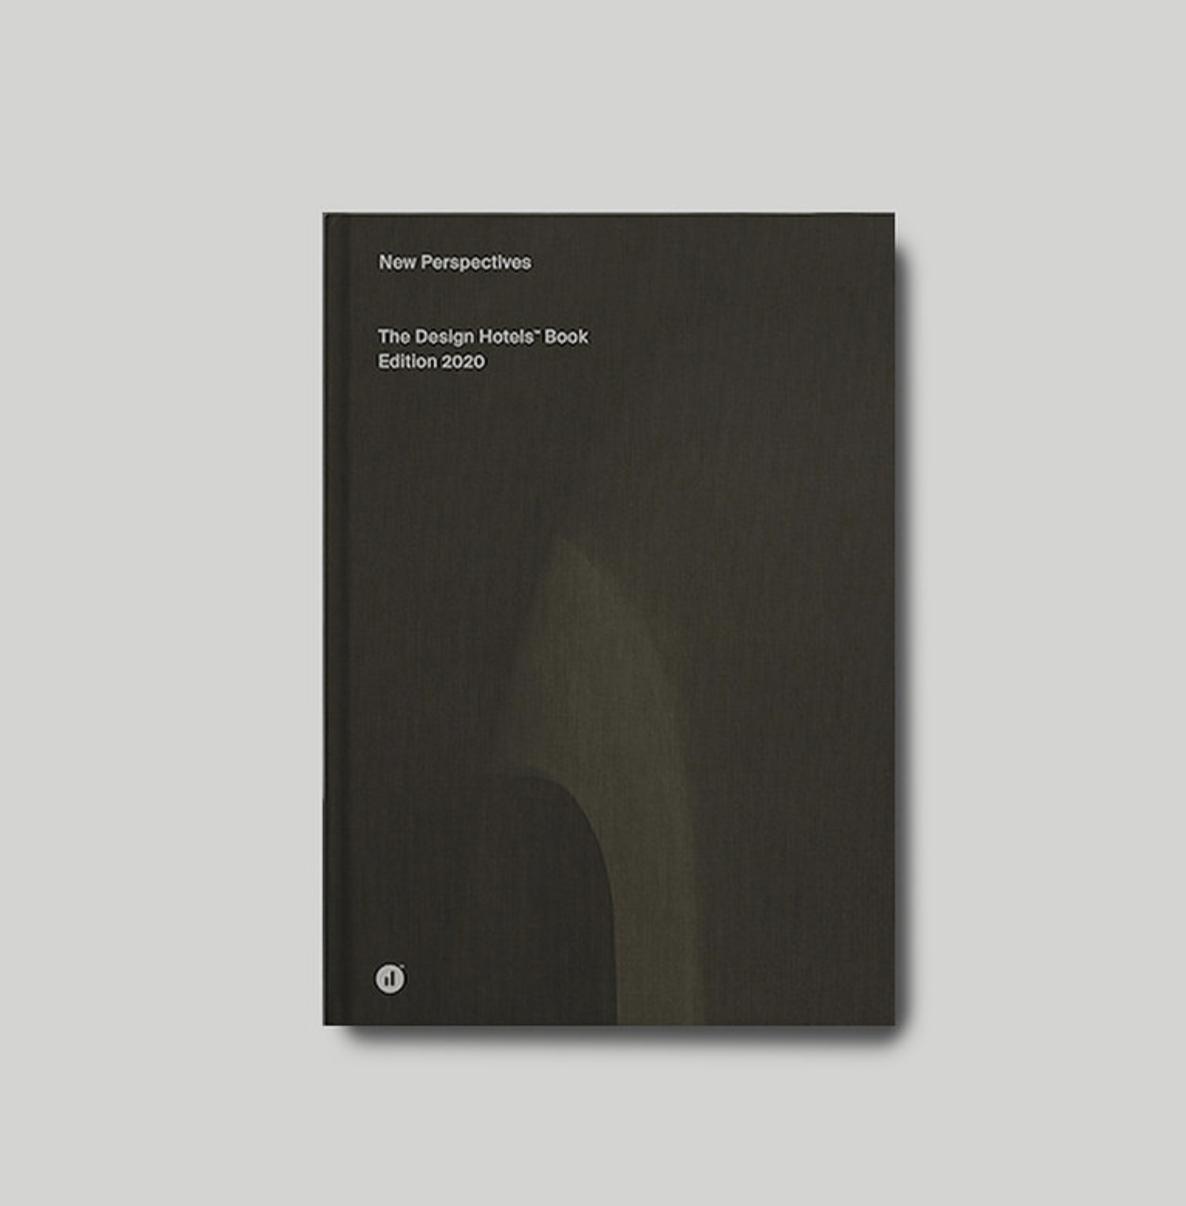 The Design Hotels Book 2020